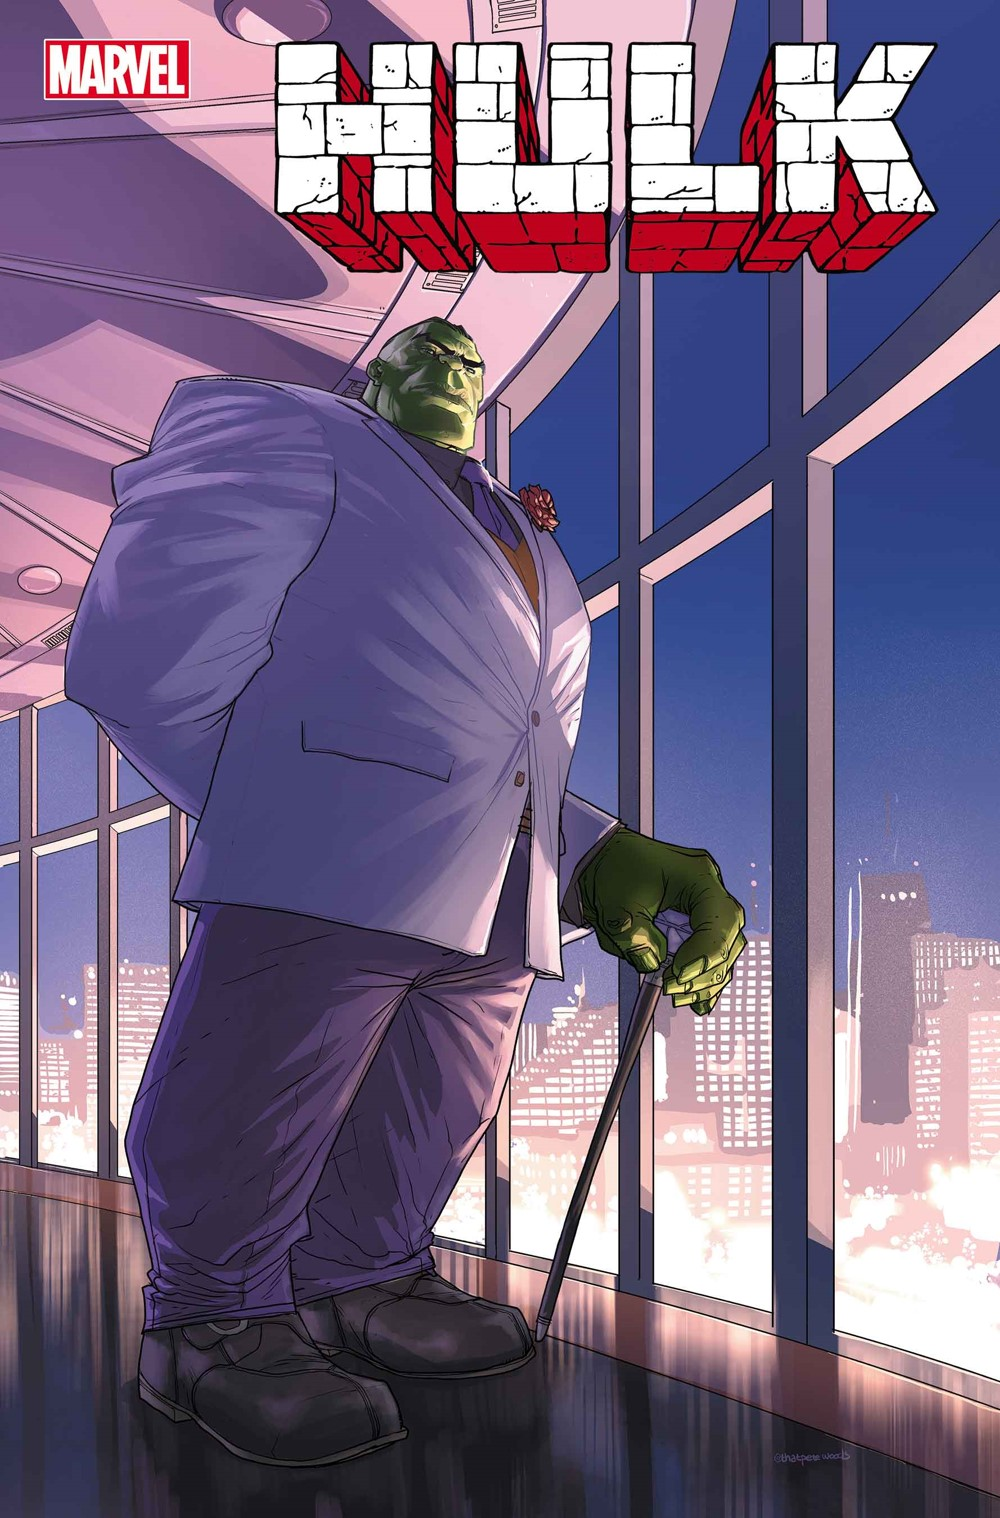 HULK2021002_DevilsReign_VAR Marvel Comics December 2021 Solicitations